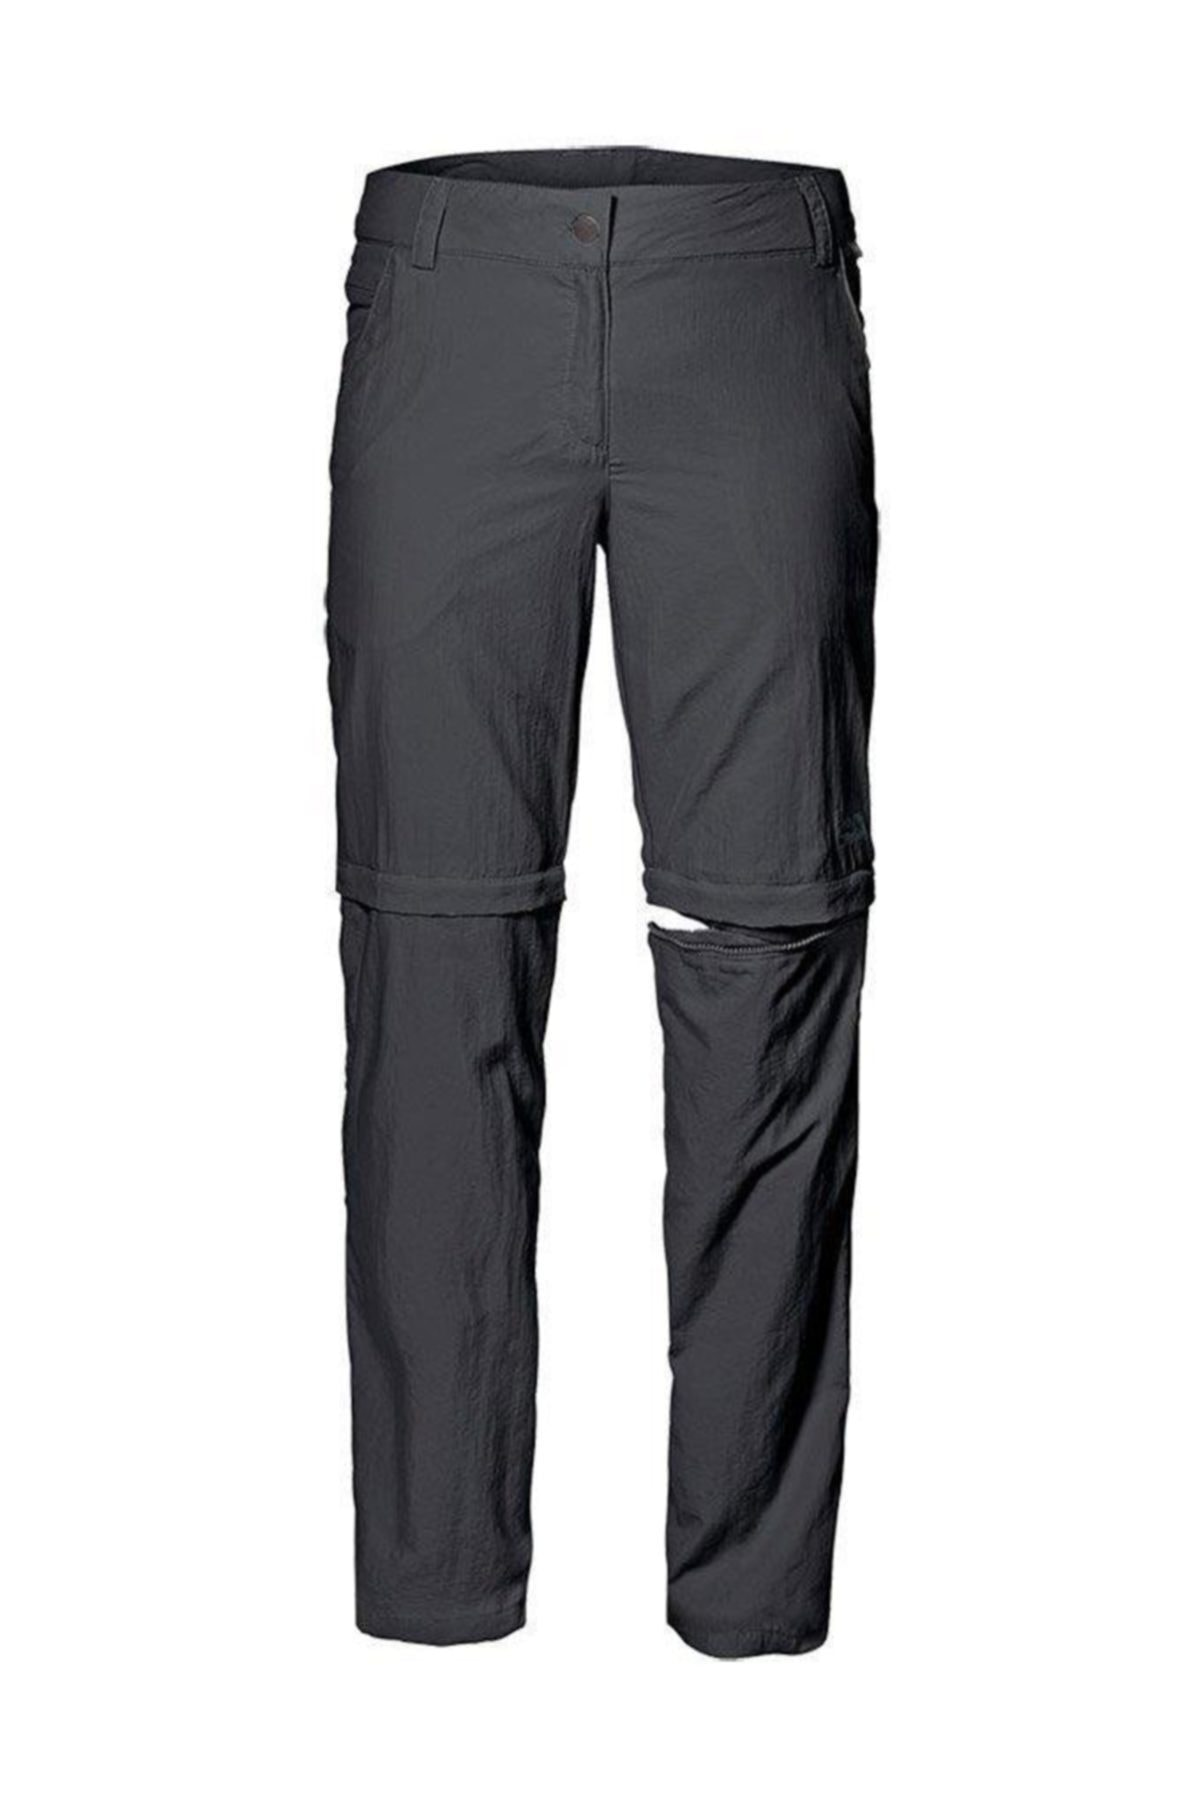 Jack Wolfskin Marakech Zip Off Kadın Pantolon - 1503641-6350 1